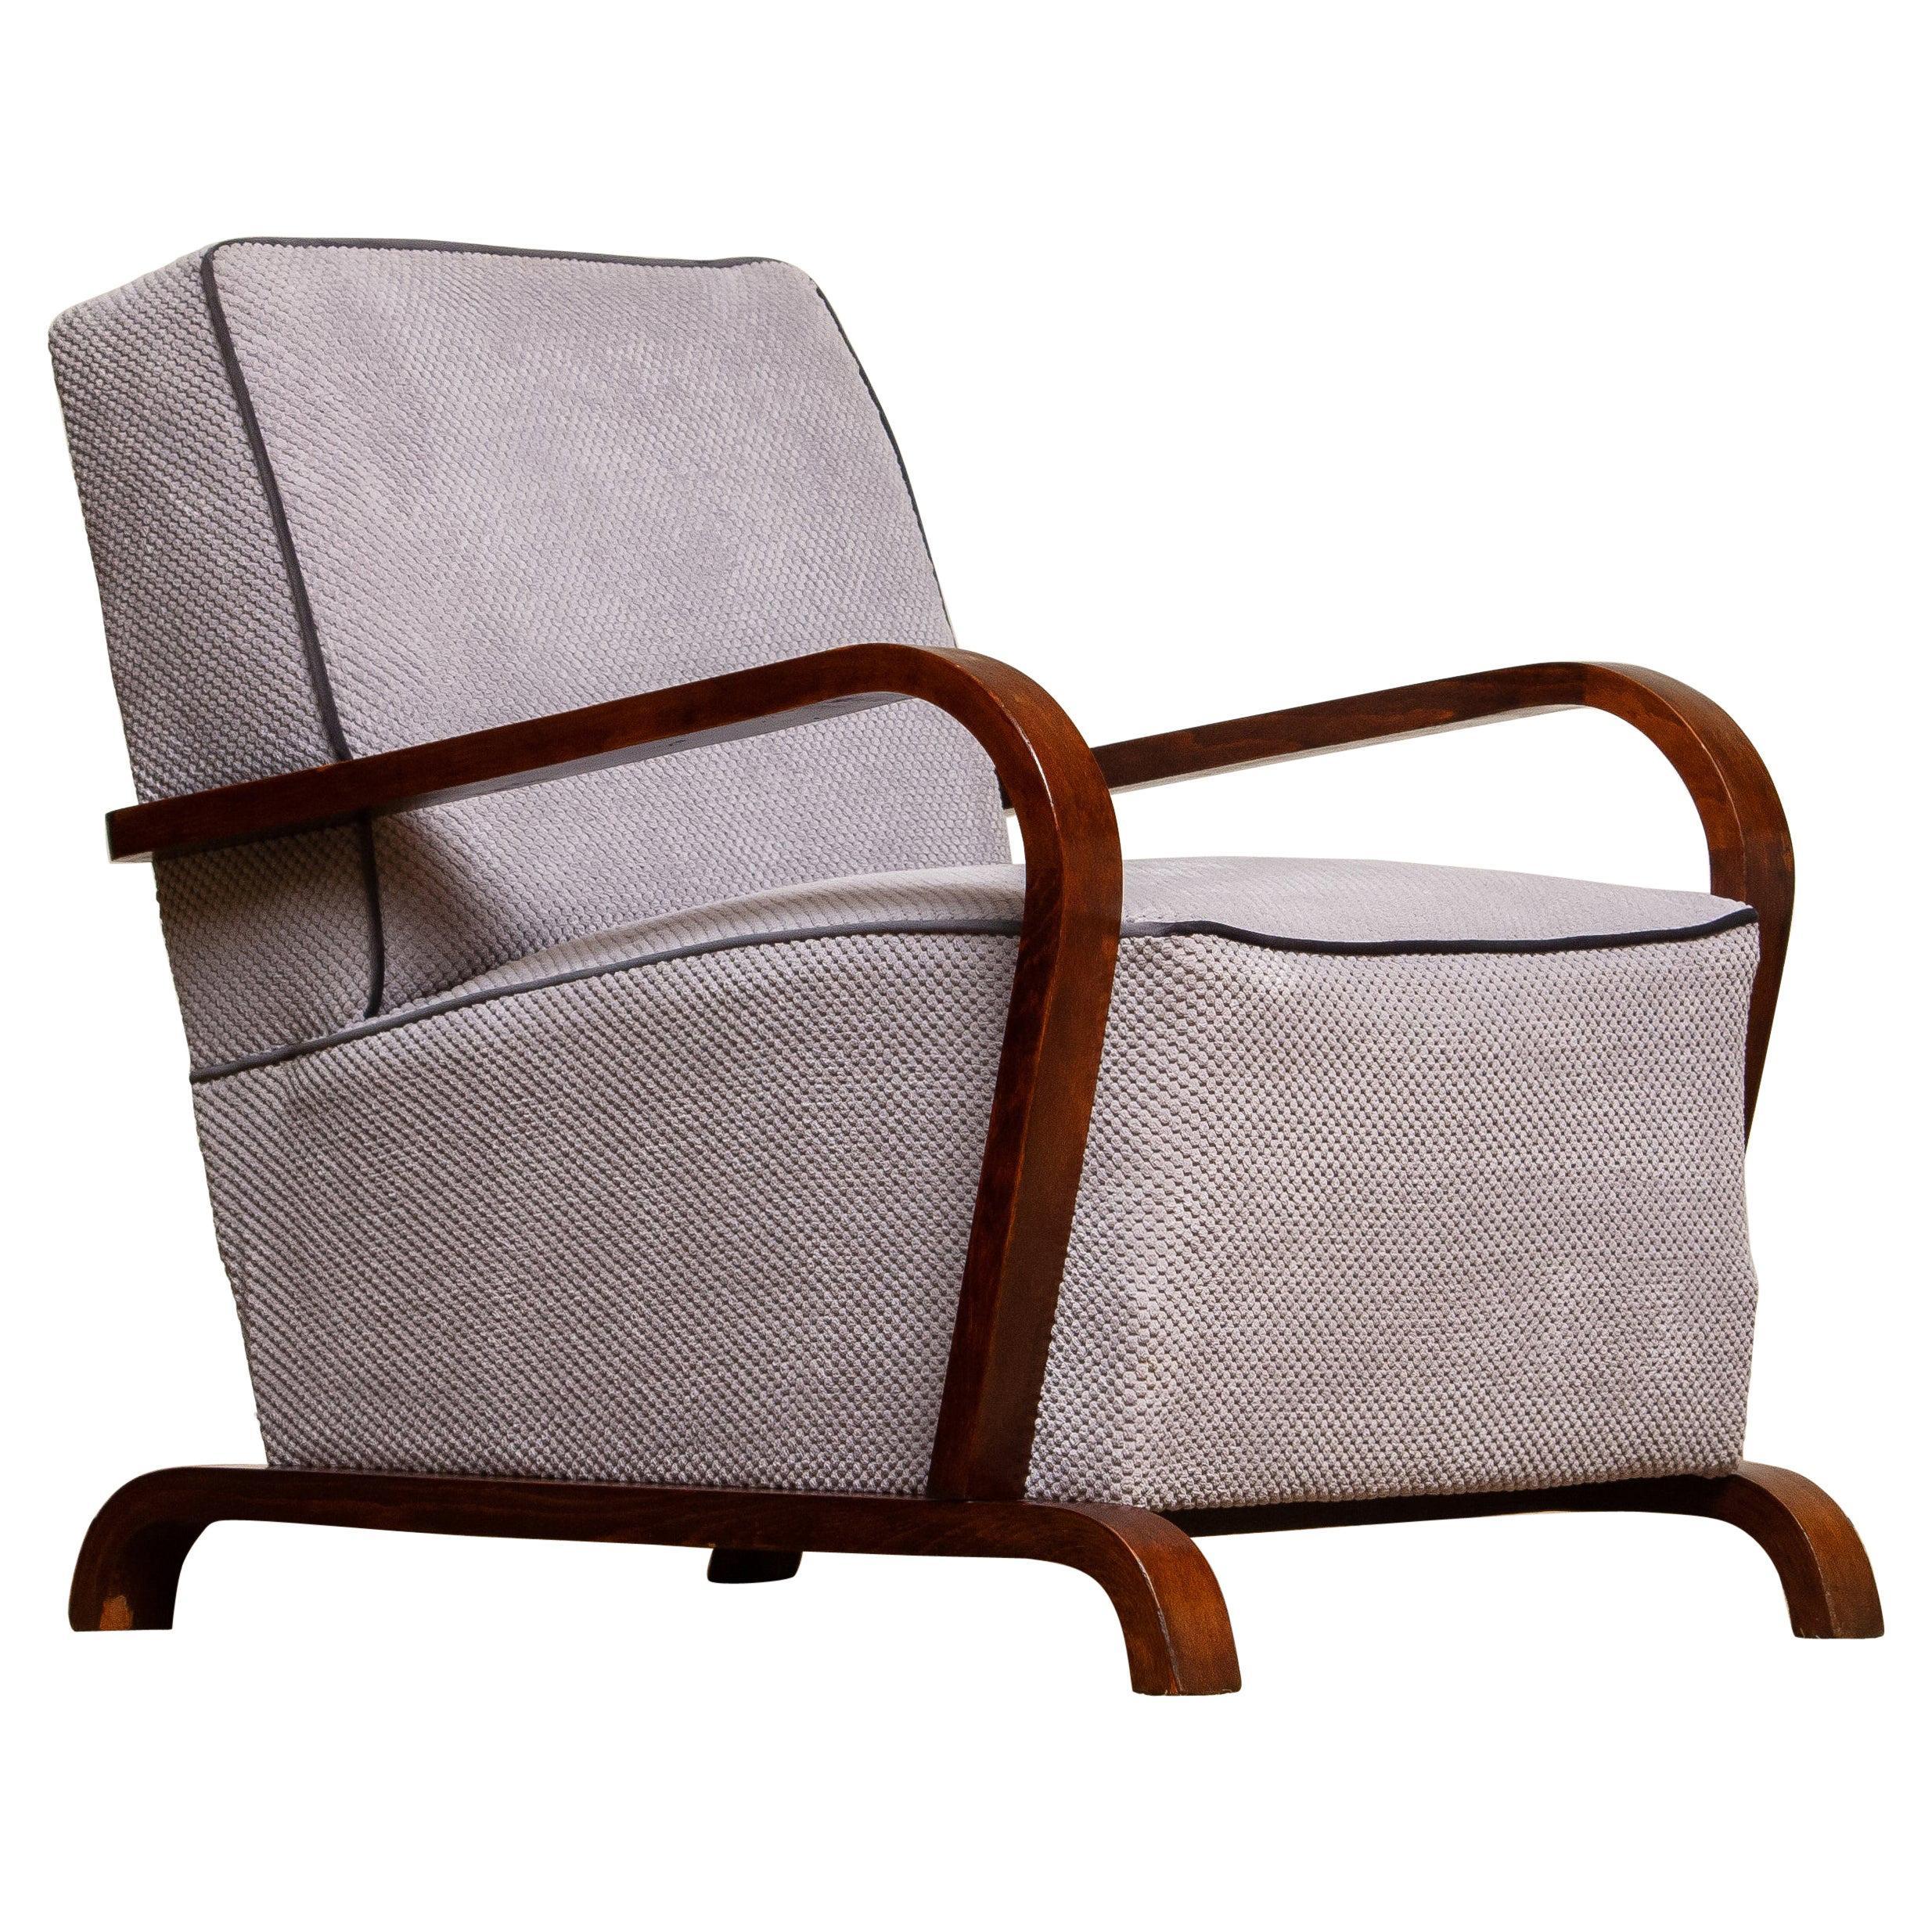 1920s, Scandinavian Art Deco Armchair Lounge Club Chair from Sweden